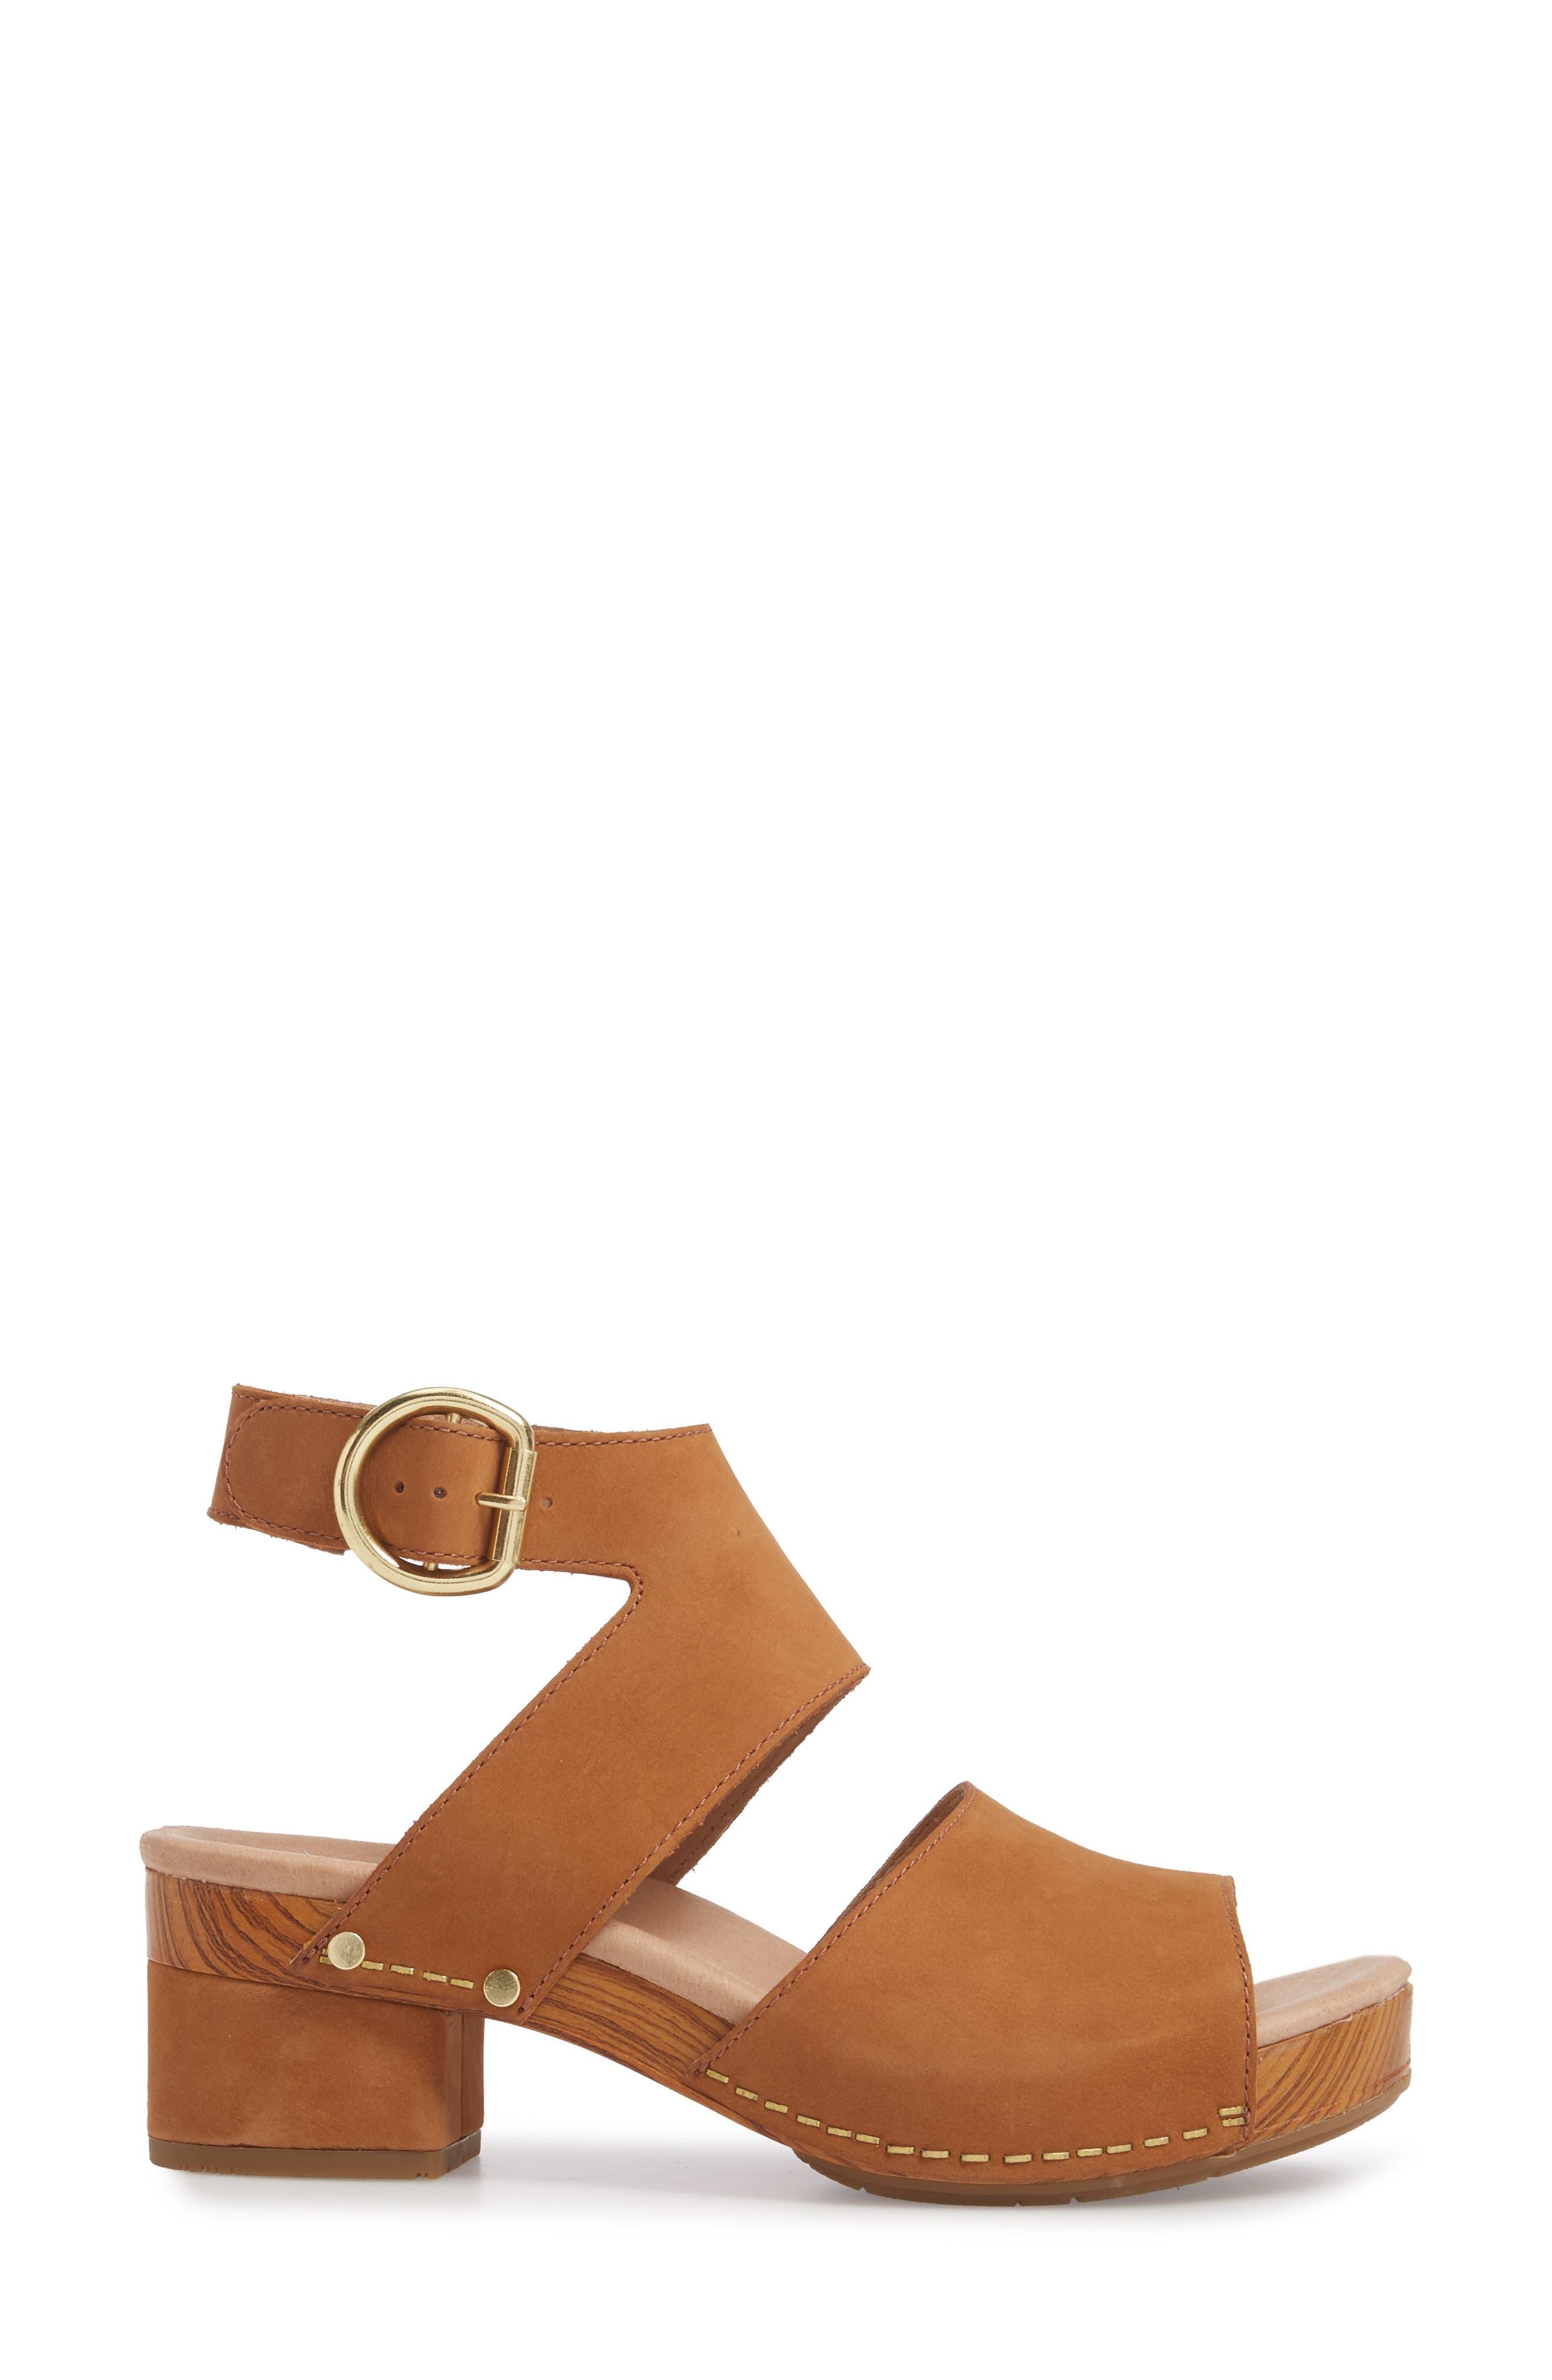 Minka Sandal,                             Alternate thumbnail 3, color,                             Camel Milled Nubuck Leather